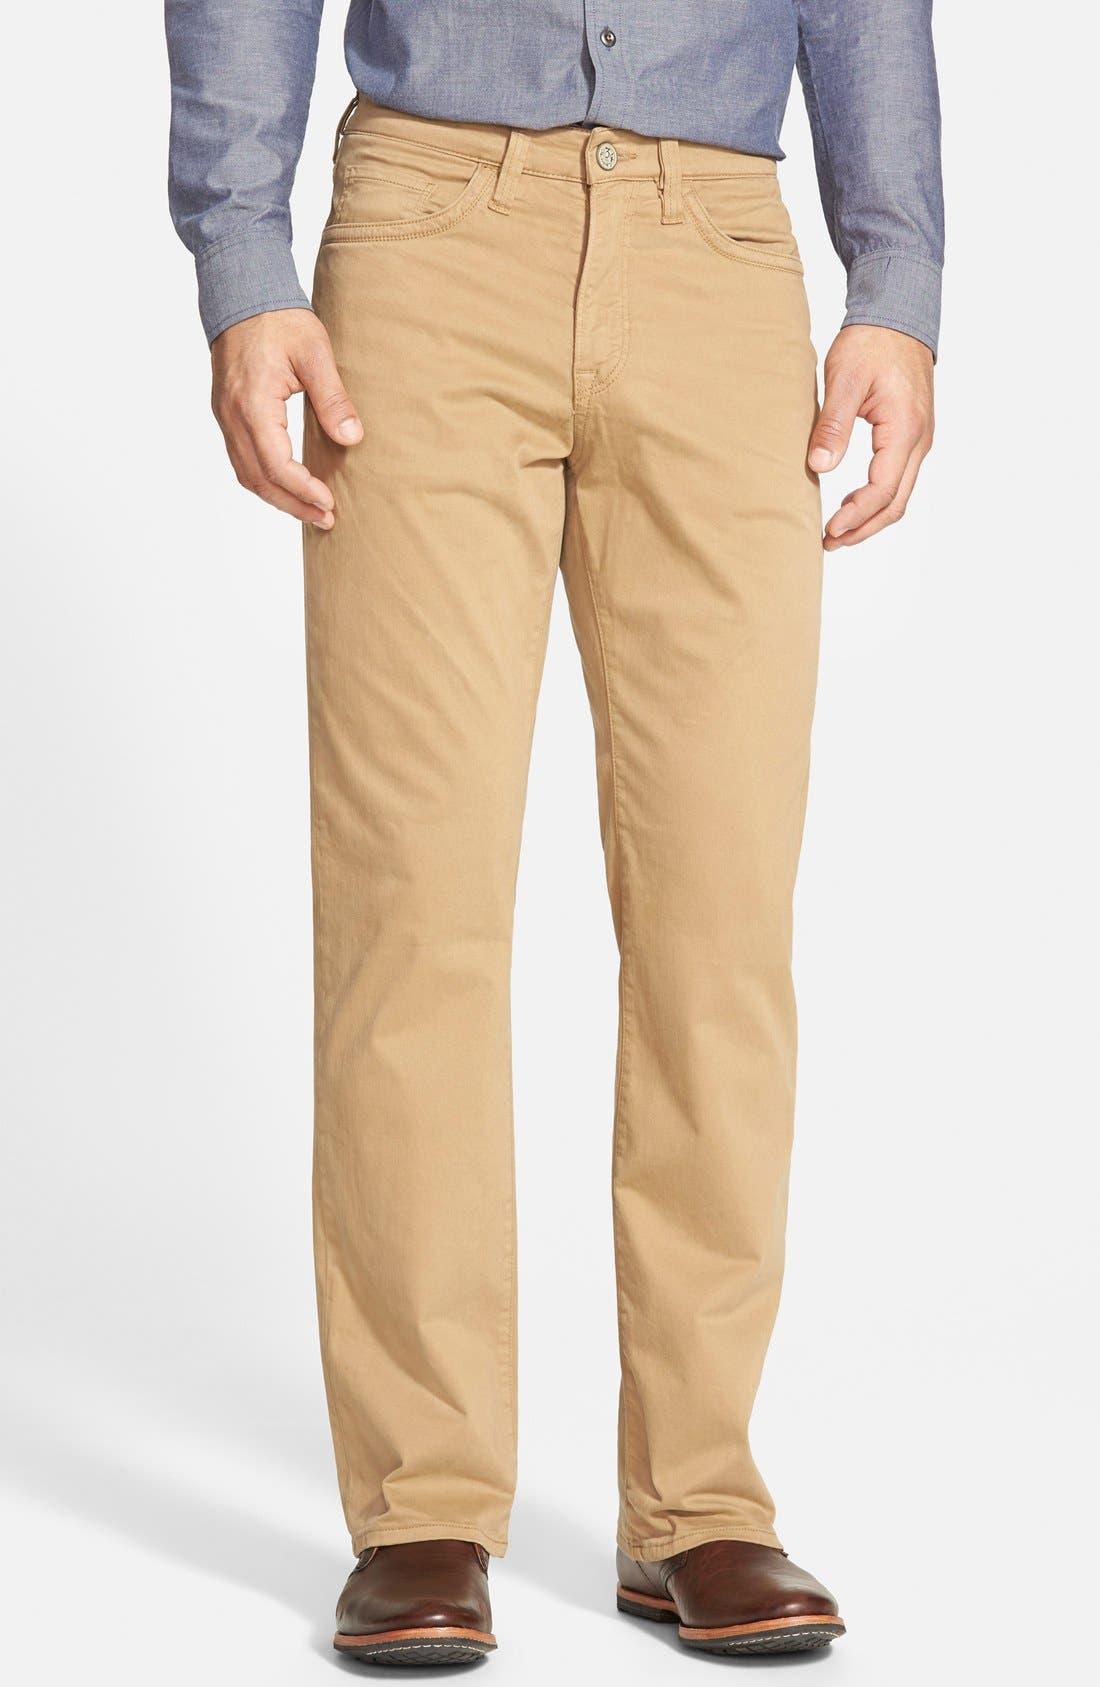 'Charisma' Classic Relaxed Fit Pants,                         Main,                         color, BEIGE/ KHAKI